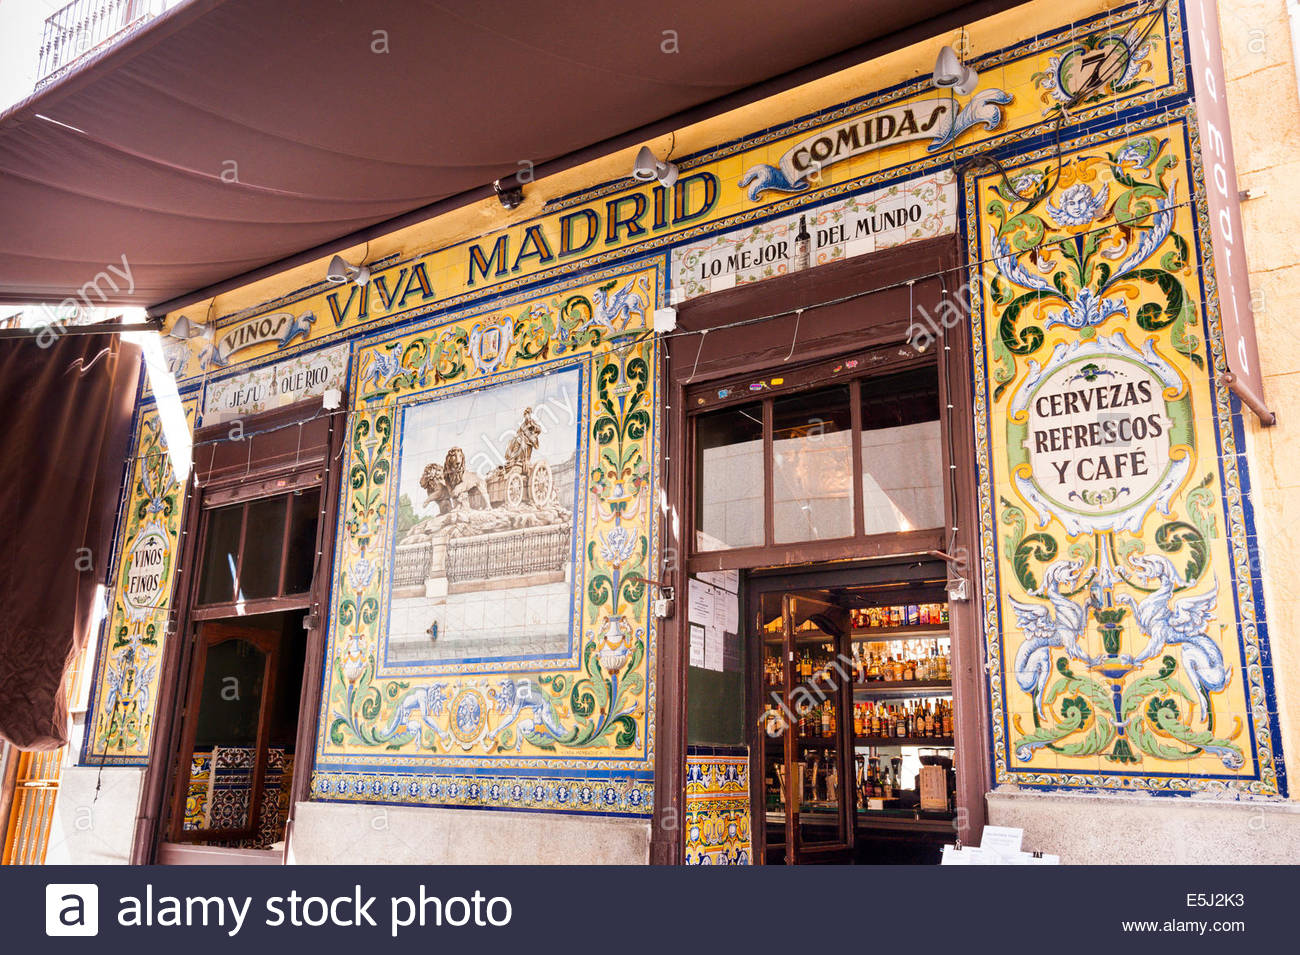 Bar Viva Madrid, Barrio de las Letras, Madrid, Espagne ...